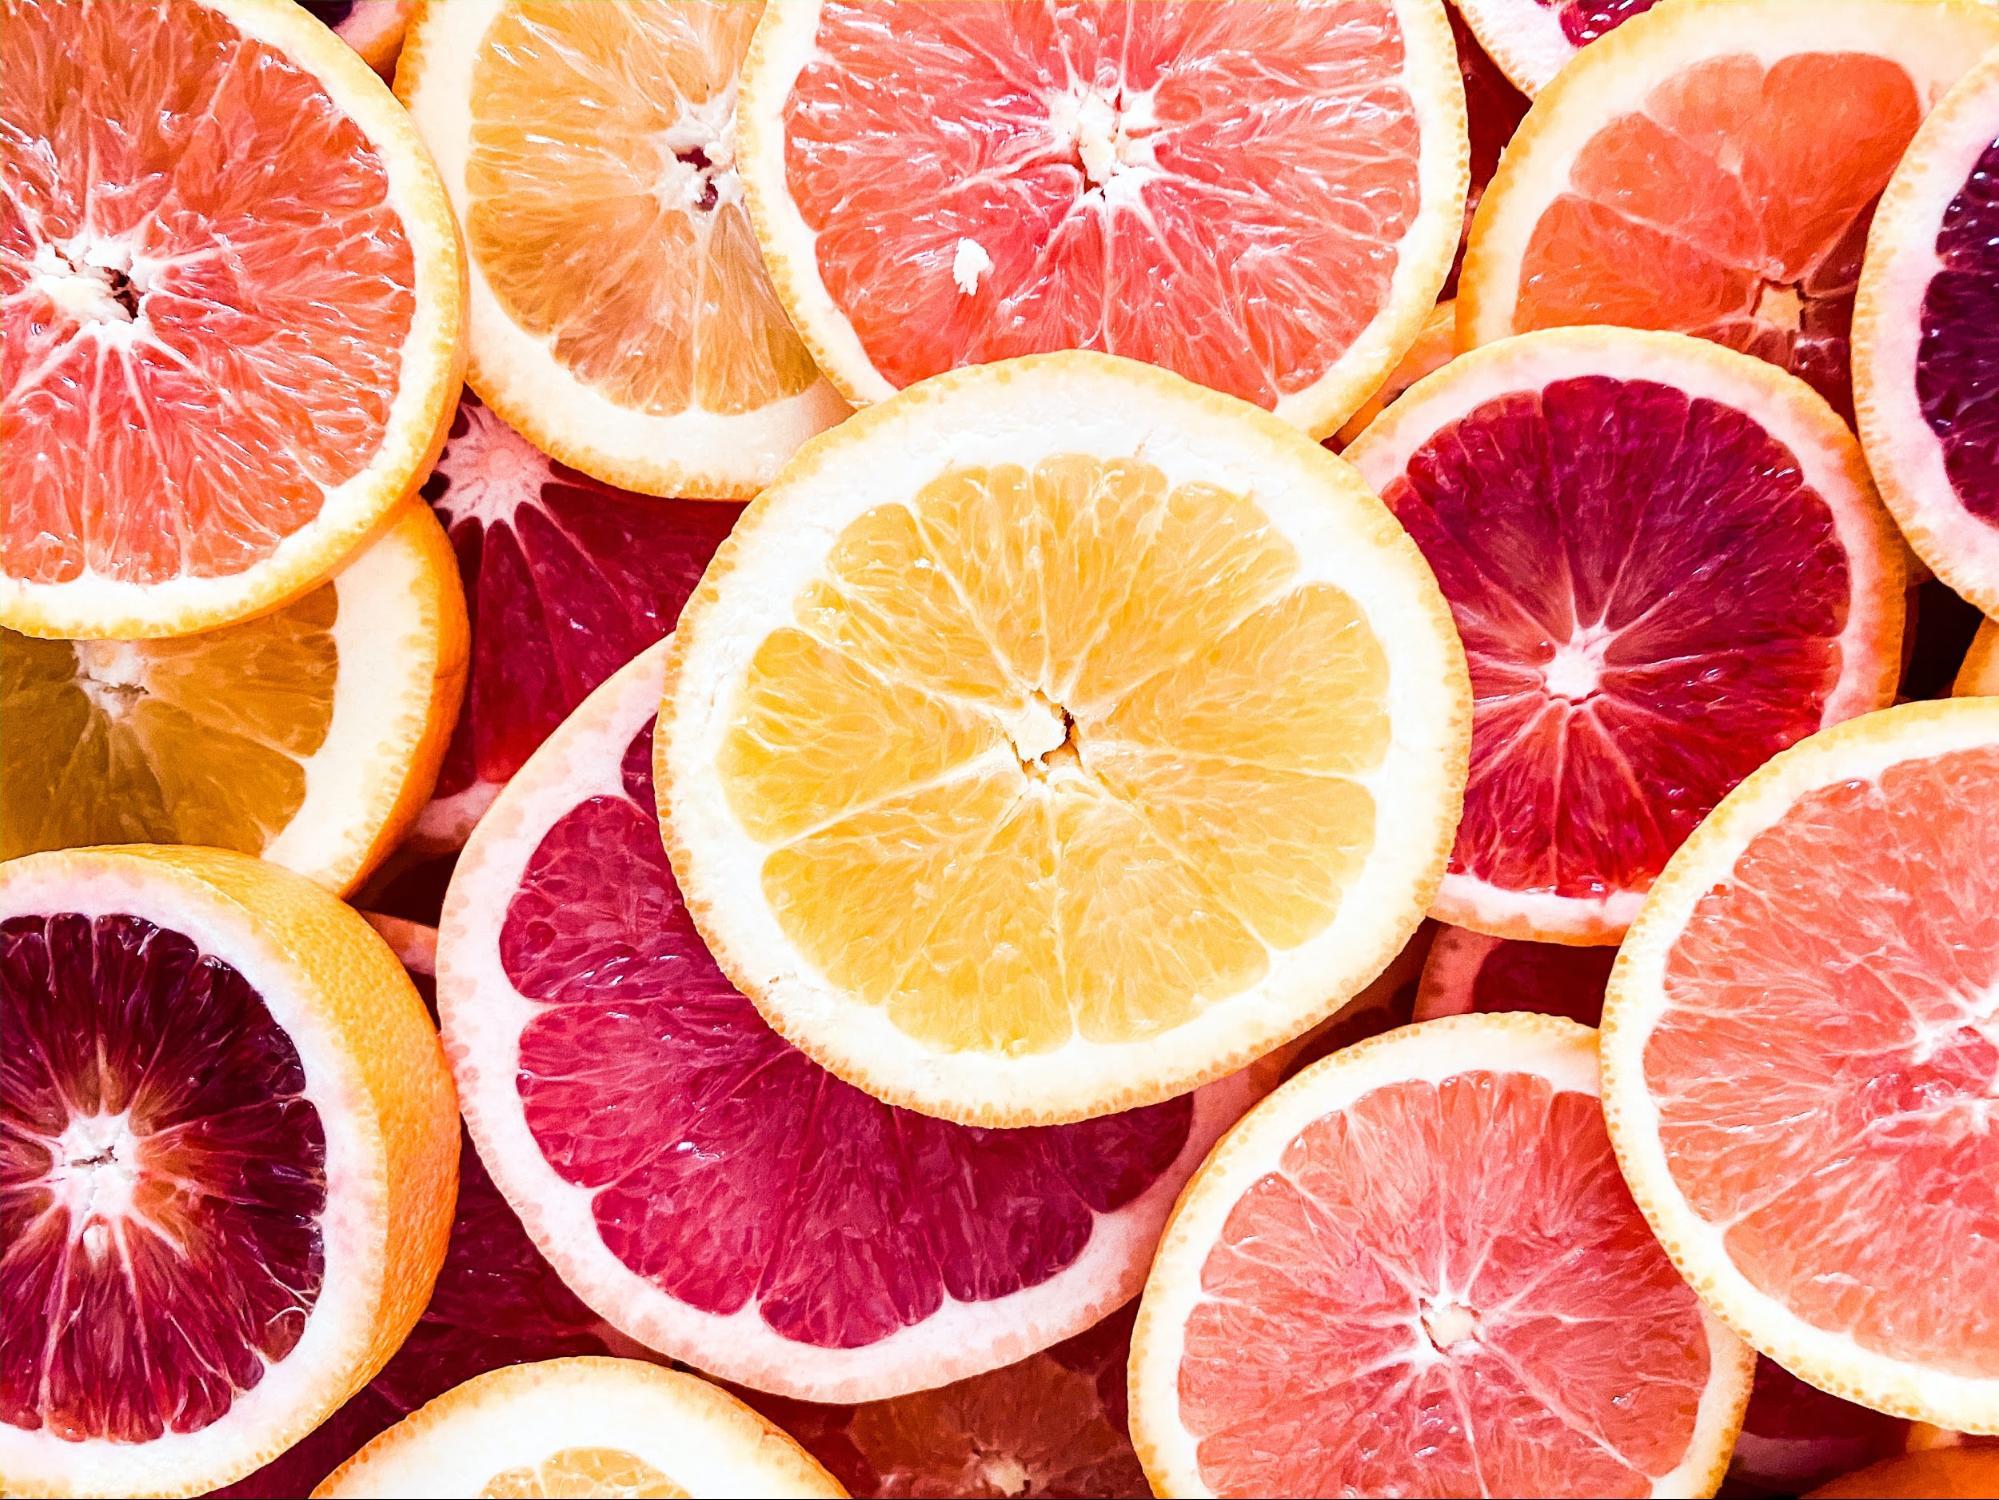 Slices of oranges and grapefruit